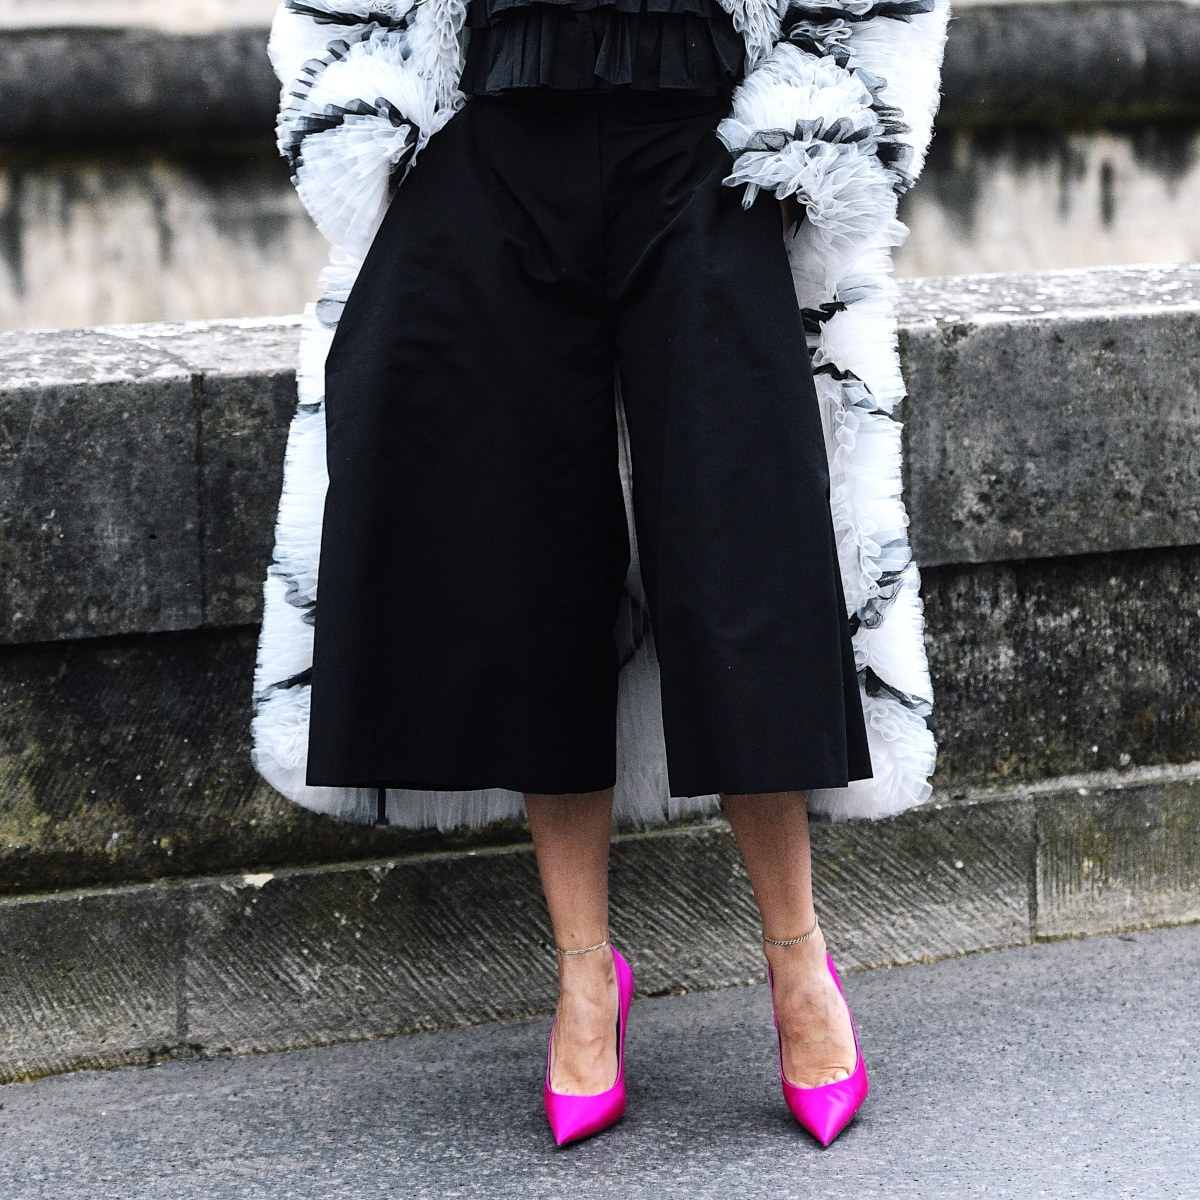 Anatomie d'un look: la jupe-culotte pointue